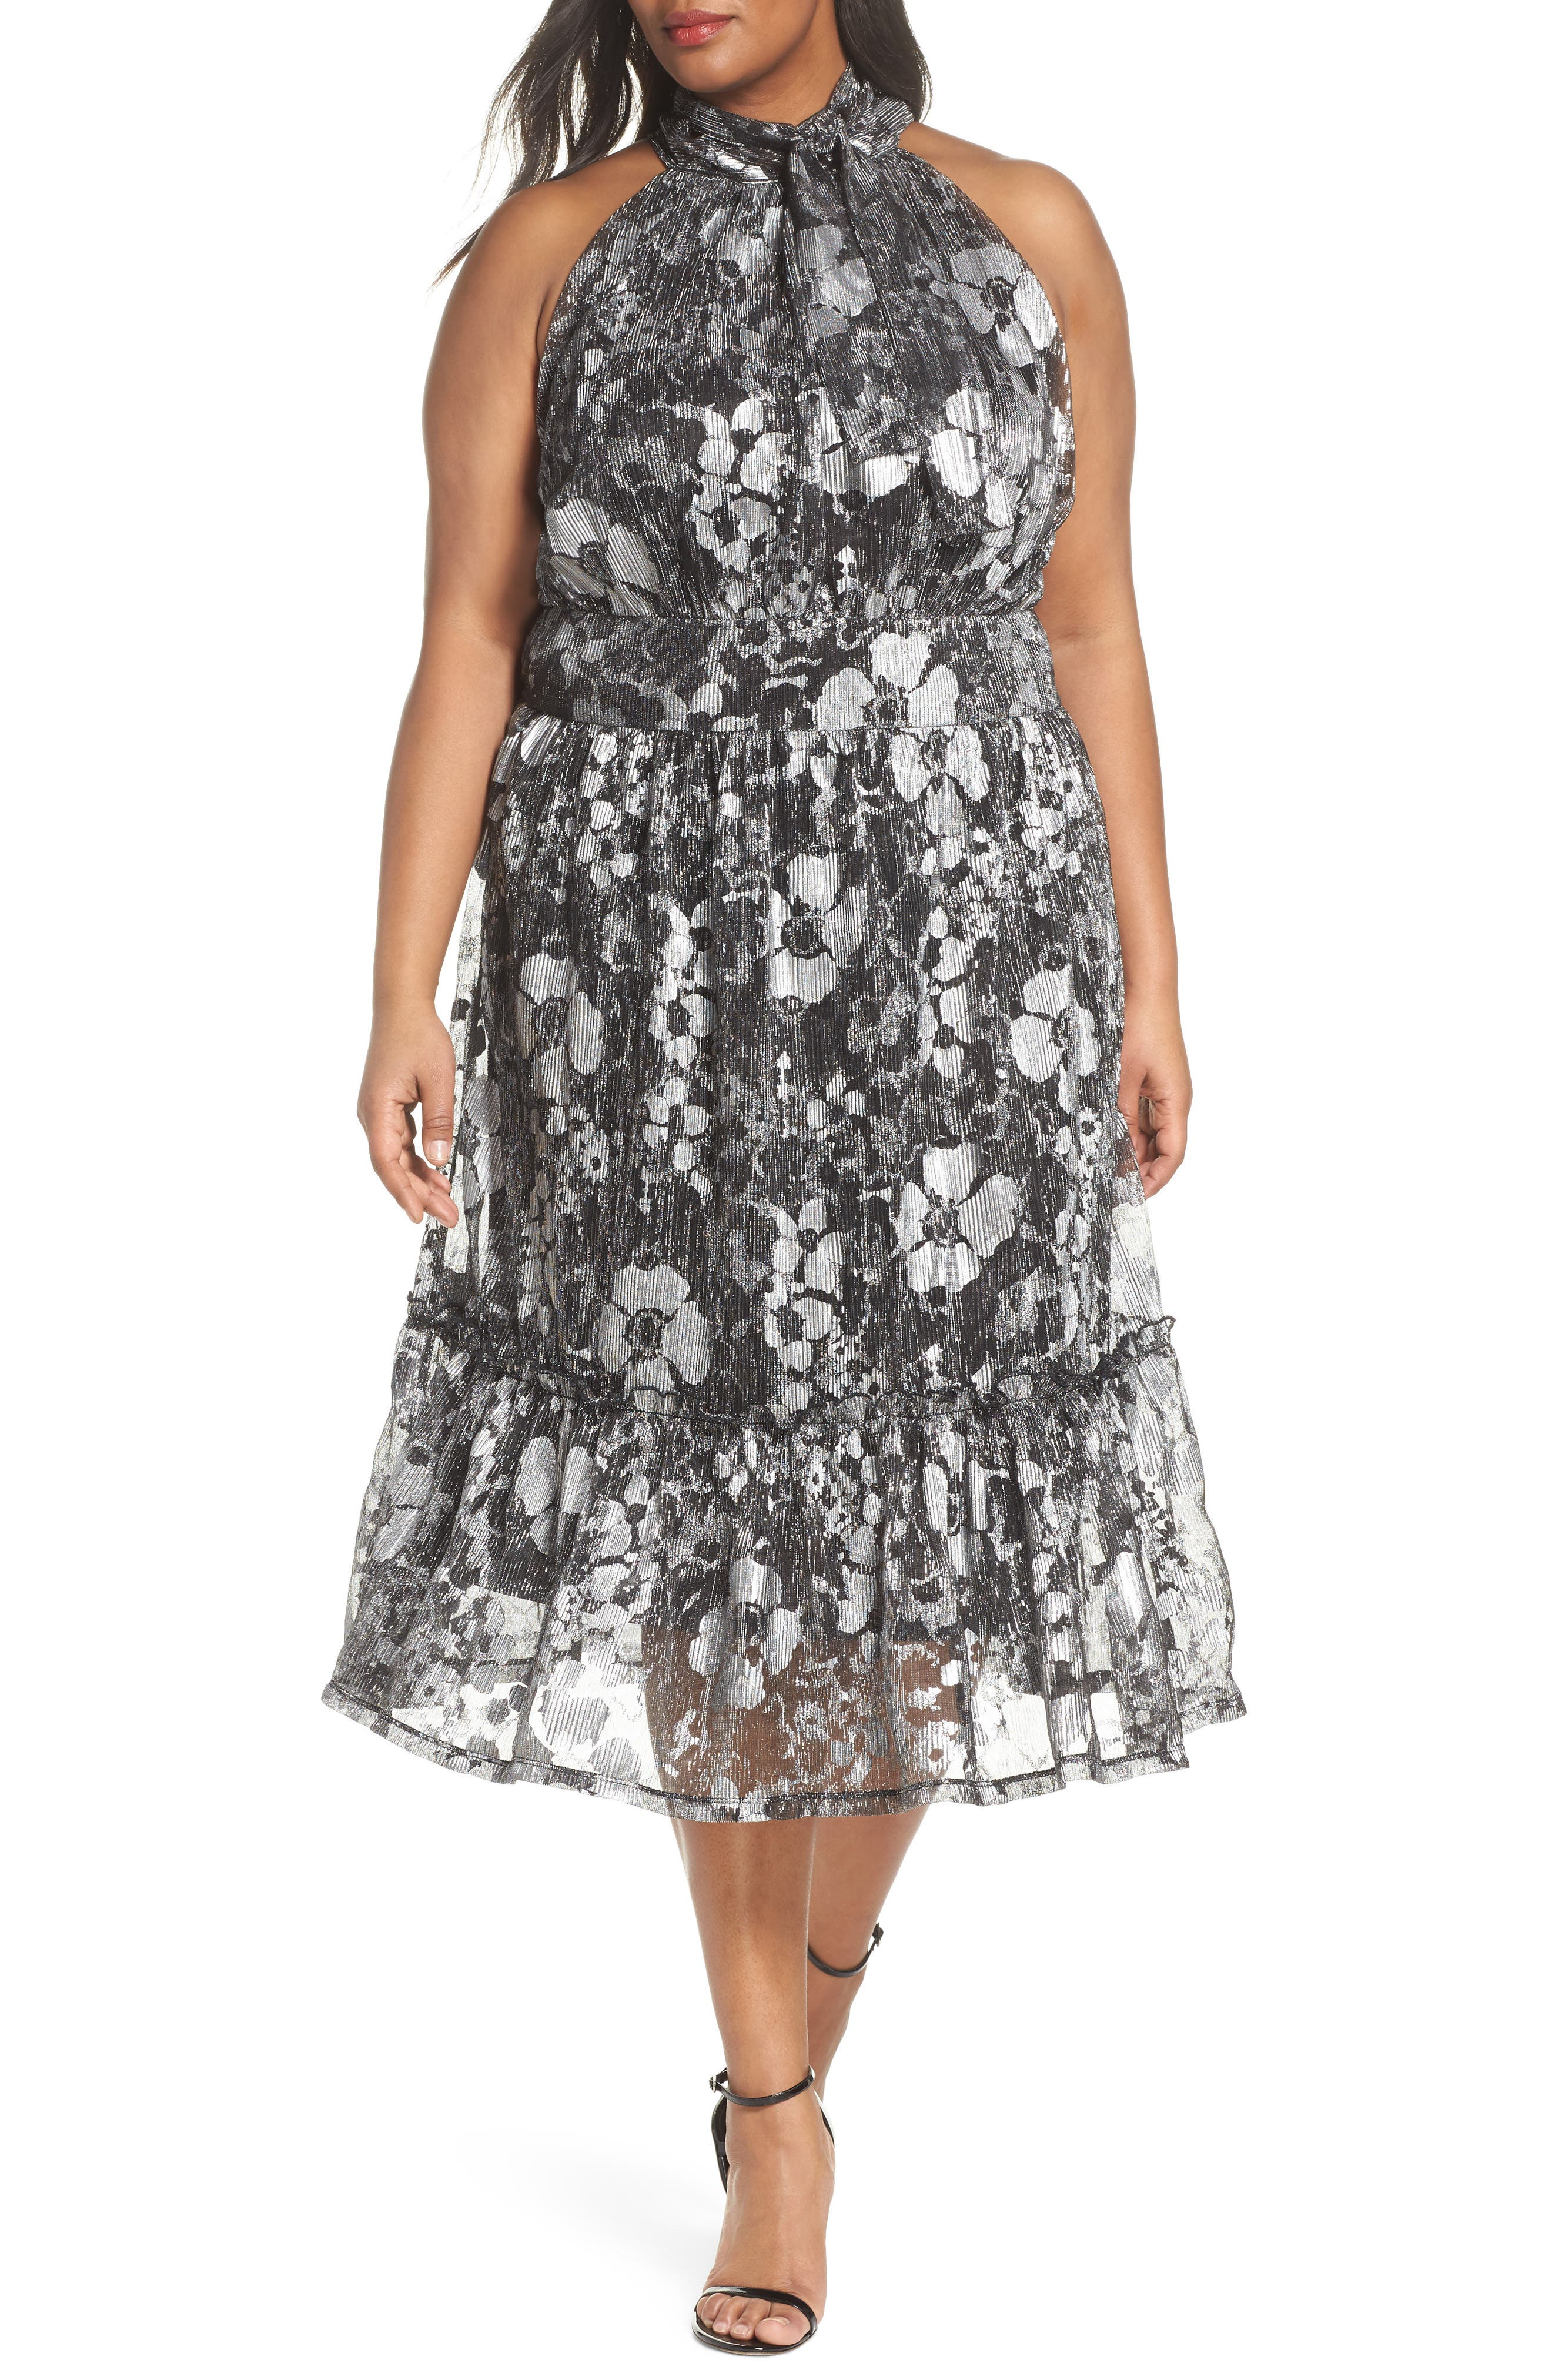 Floral Metallic Midi Dress,                         Main,                         color, Black/ Silver Foil